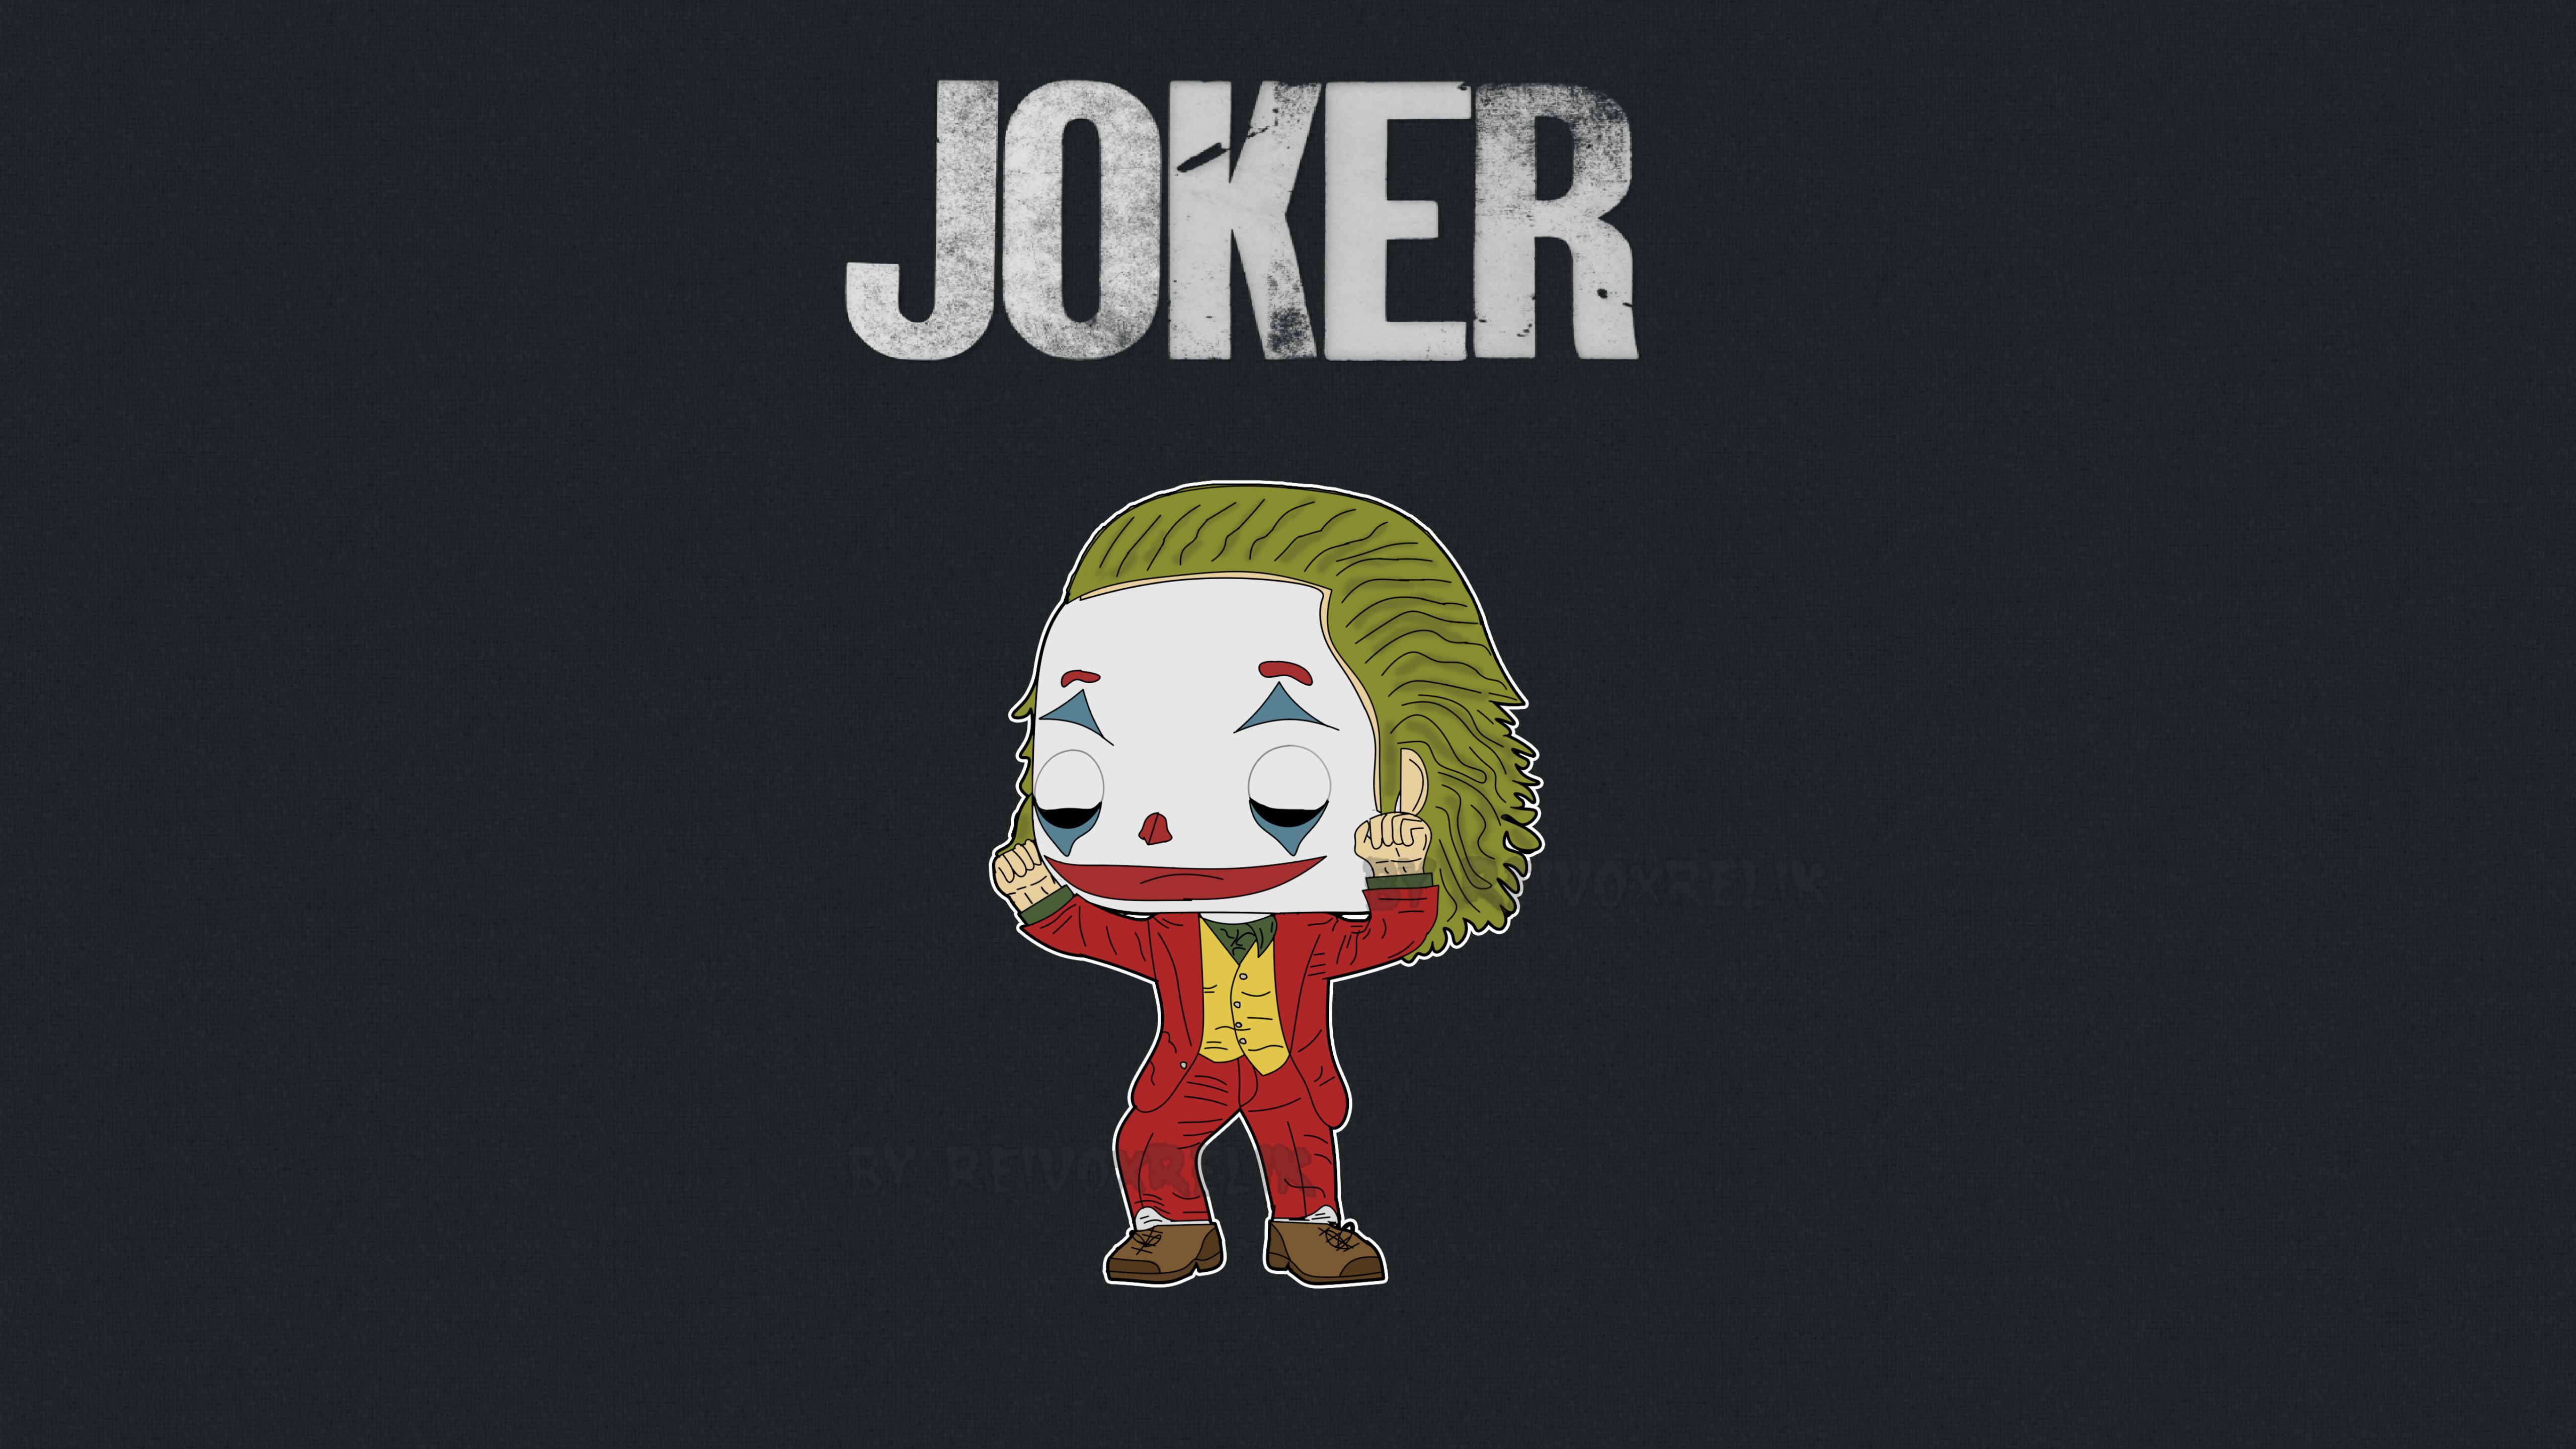 5120x2880 Joker Cartoon Art 5k Wallpaper Hd Superheroes 4k